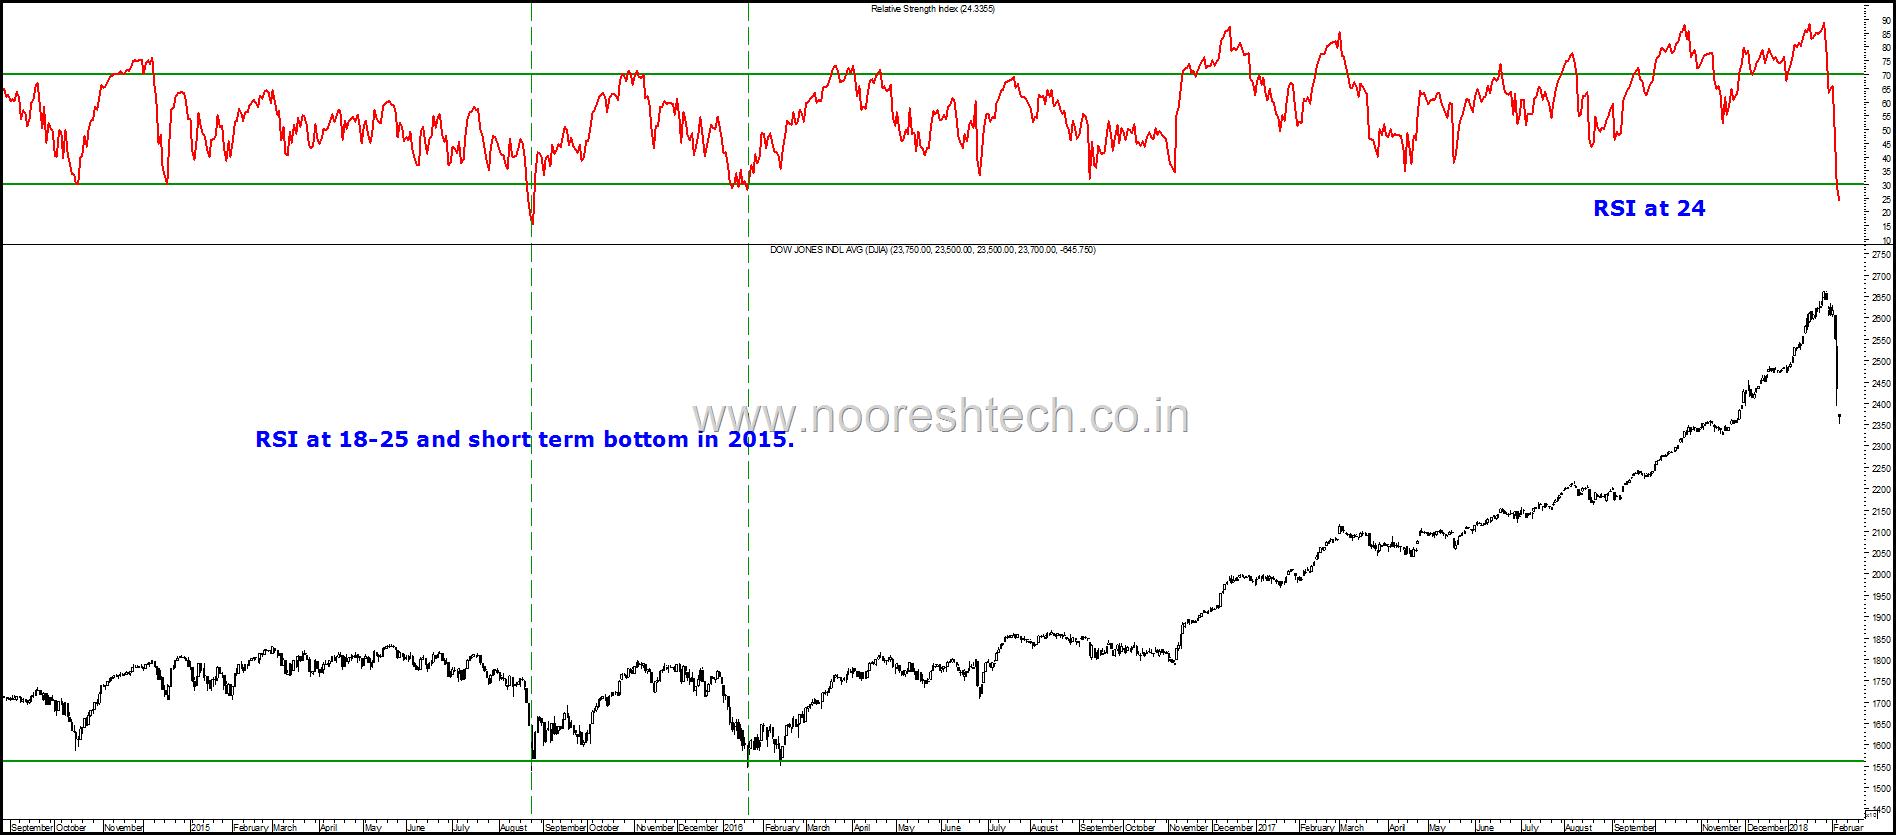 Dow Jones RSI